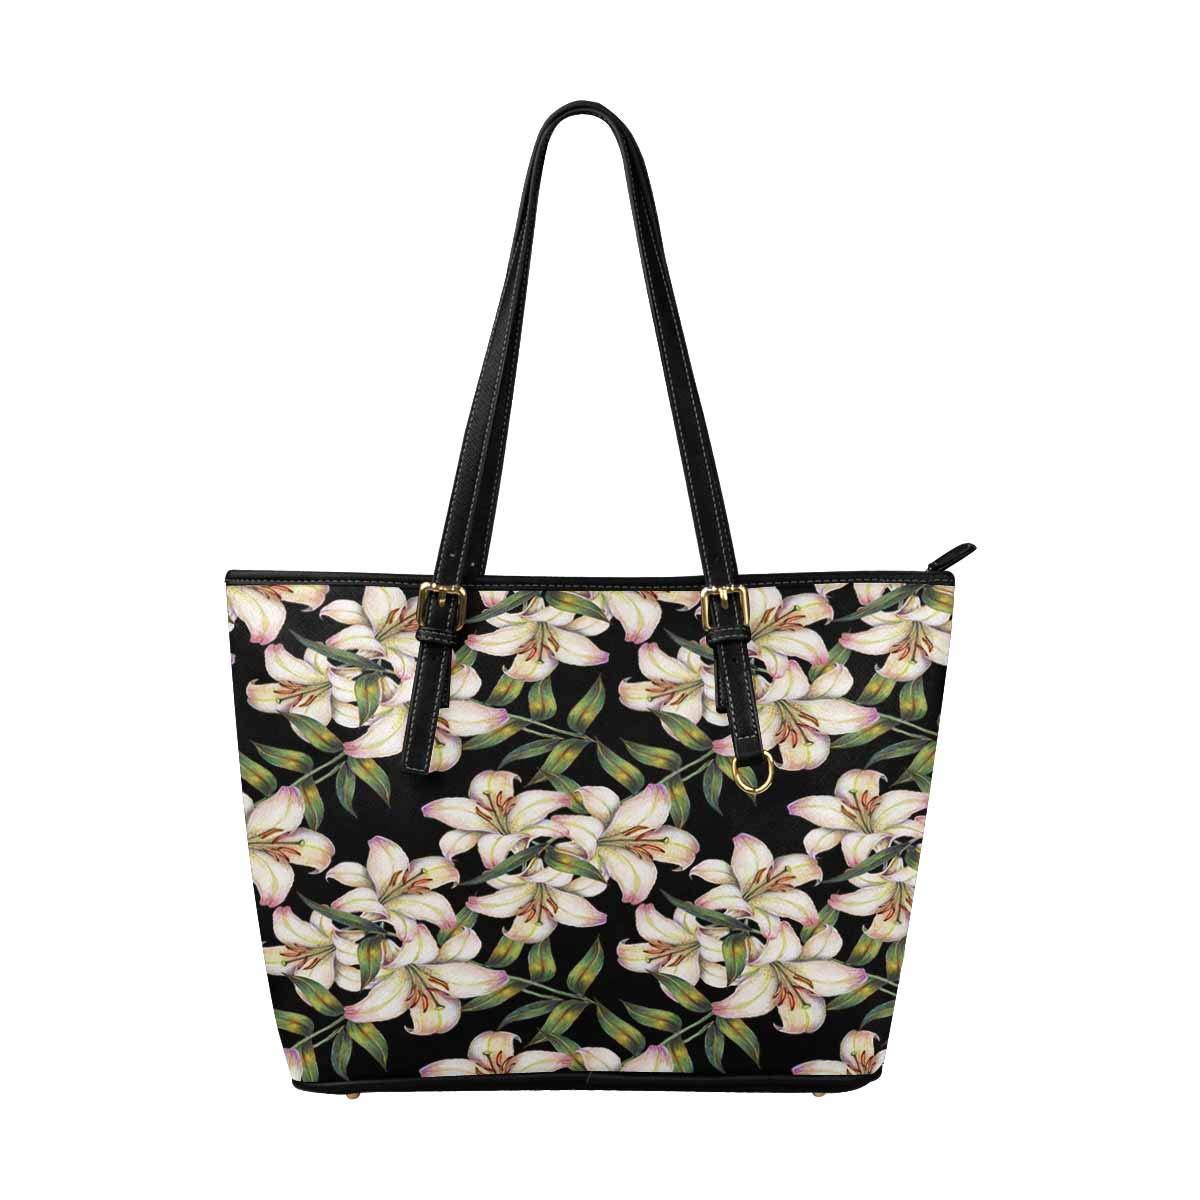 InterestPrint Womens Large Capacity Work Tote Shoulder Bag